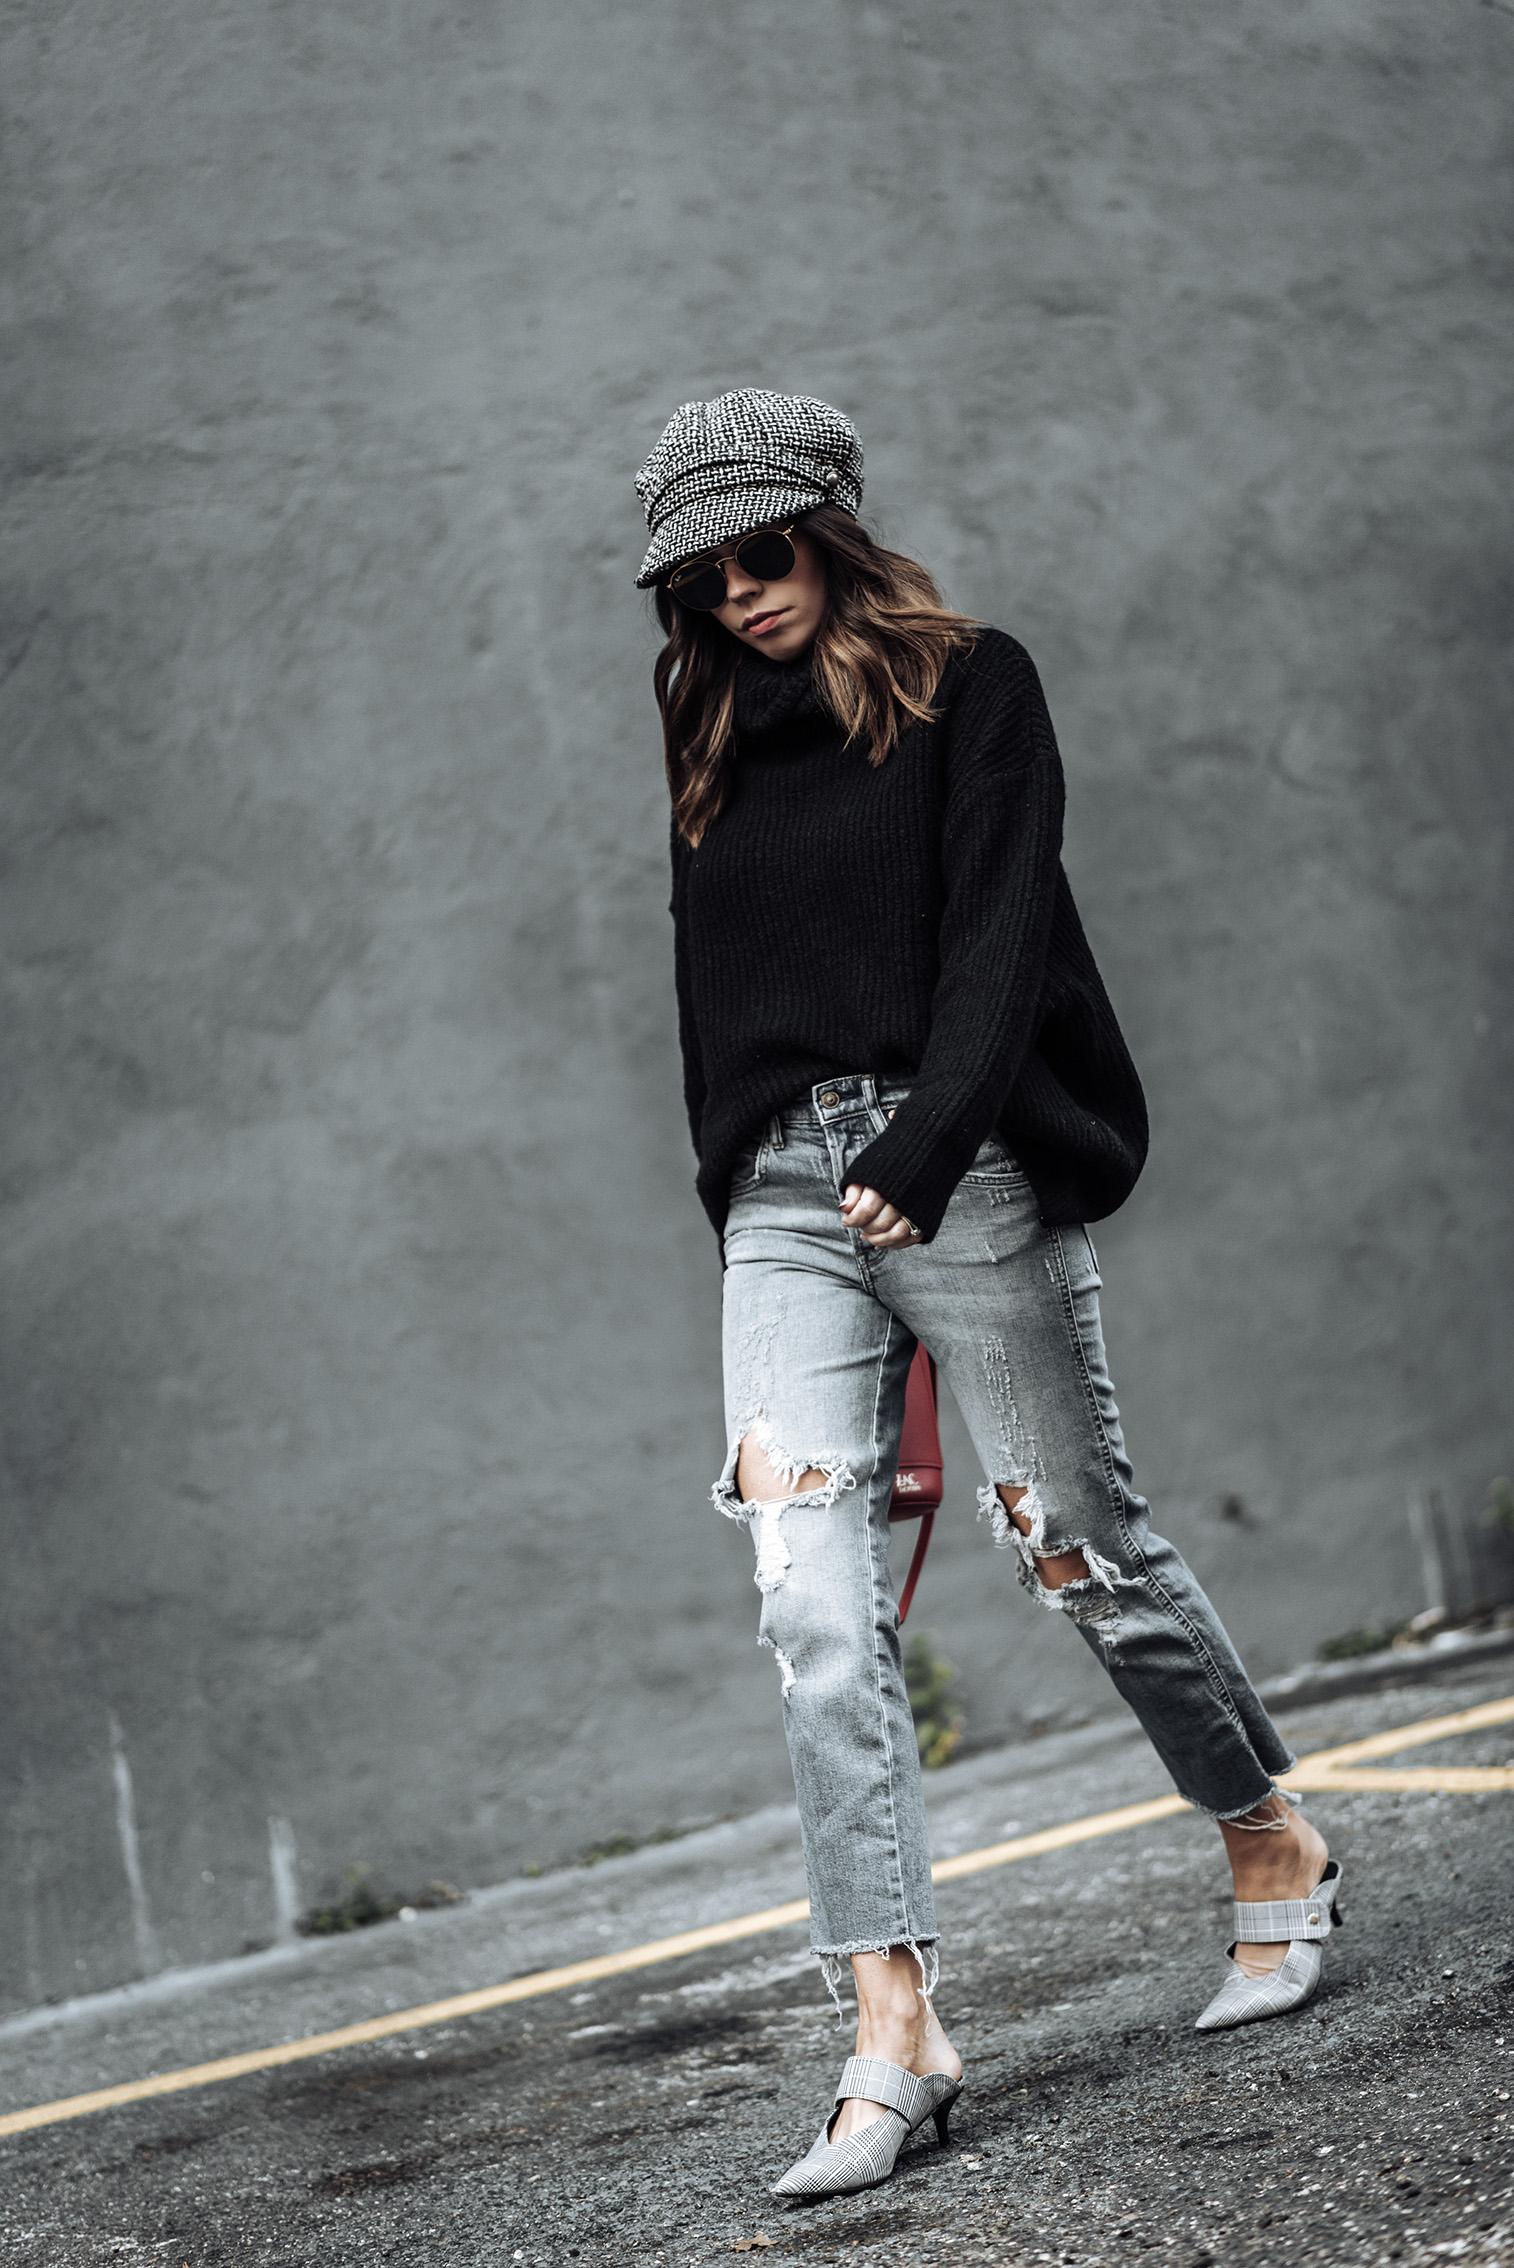 Tiffany Jais fashion and lifestyle blogger of Flaunt and Center | Houston fashion blogger | Friday Feels | Streetstyle blog | #blog #rippeddenim